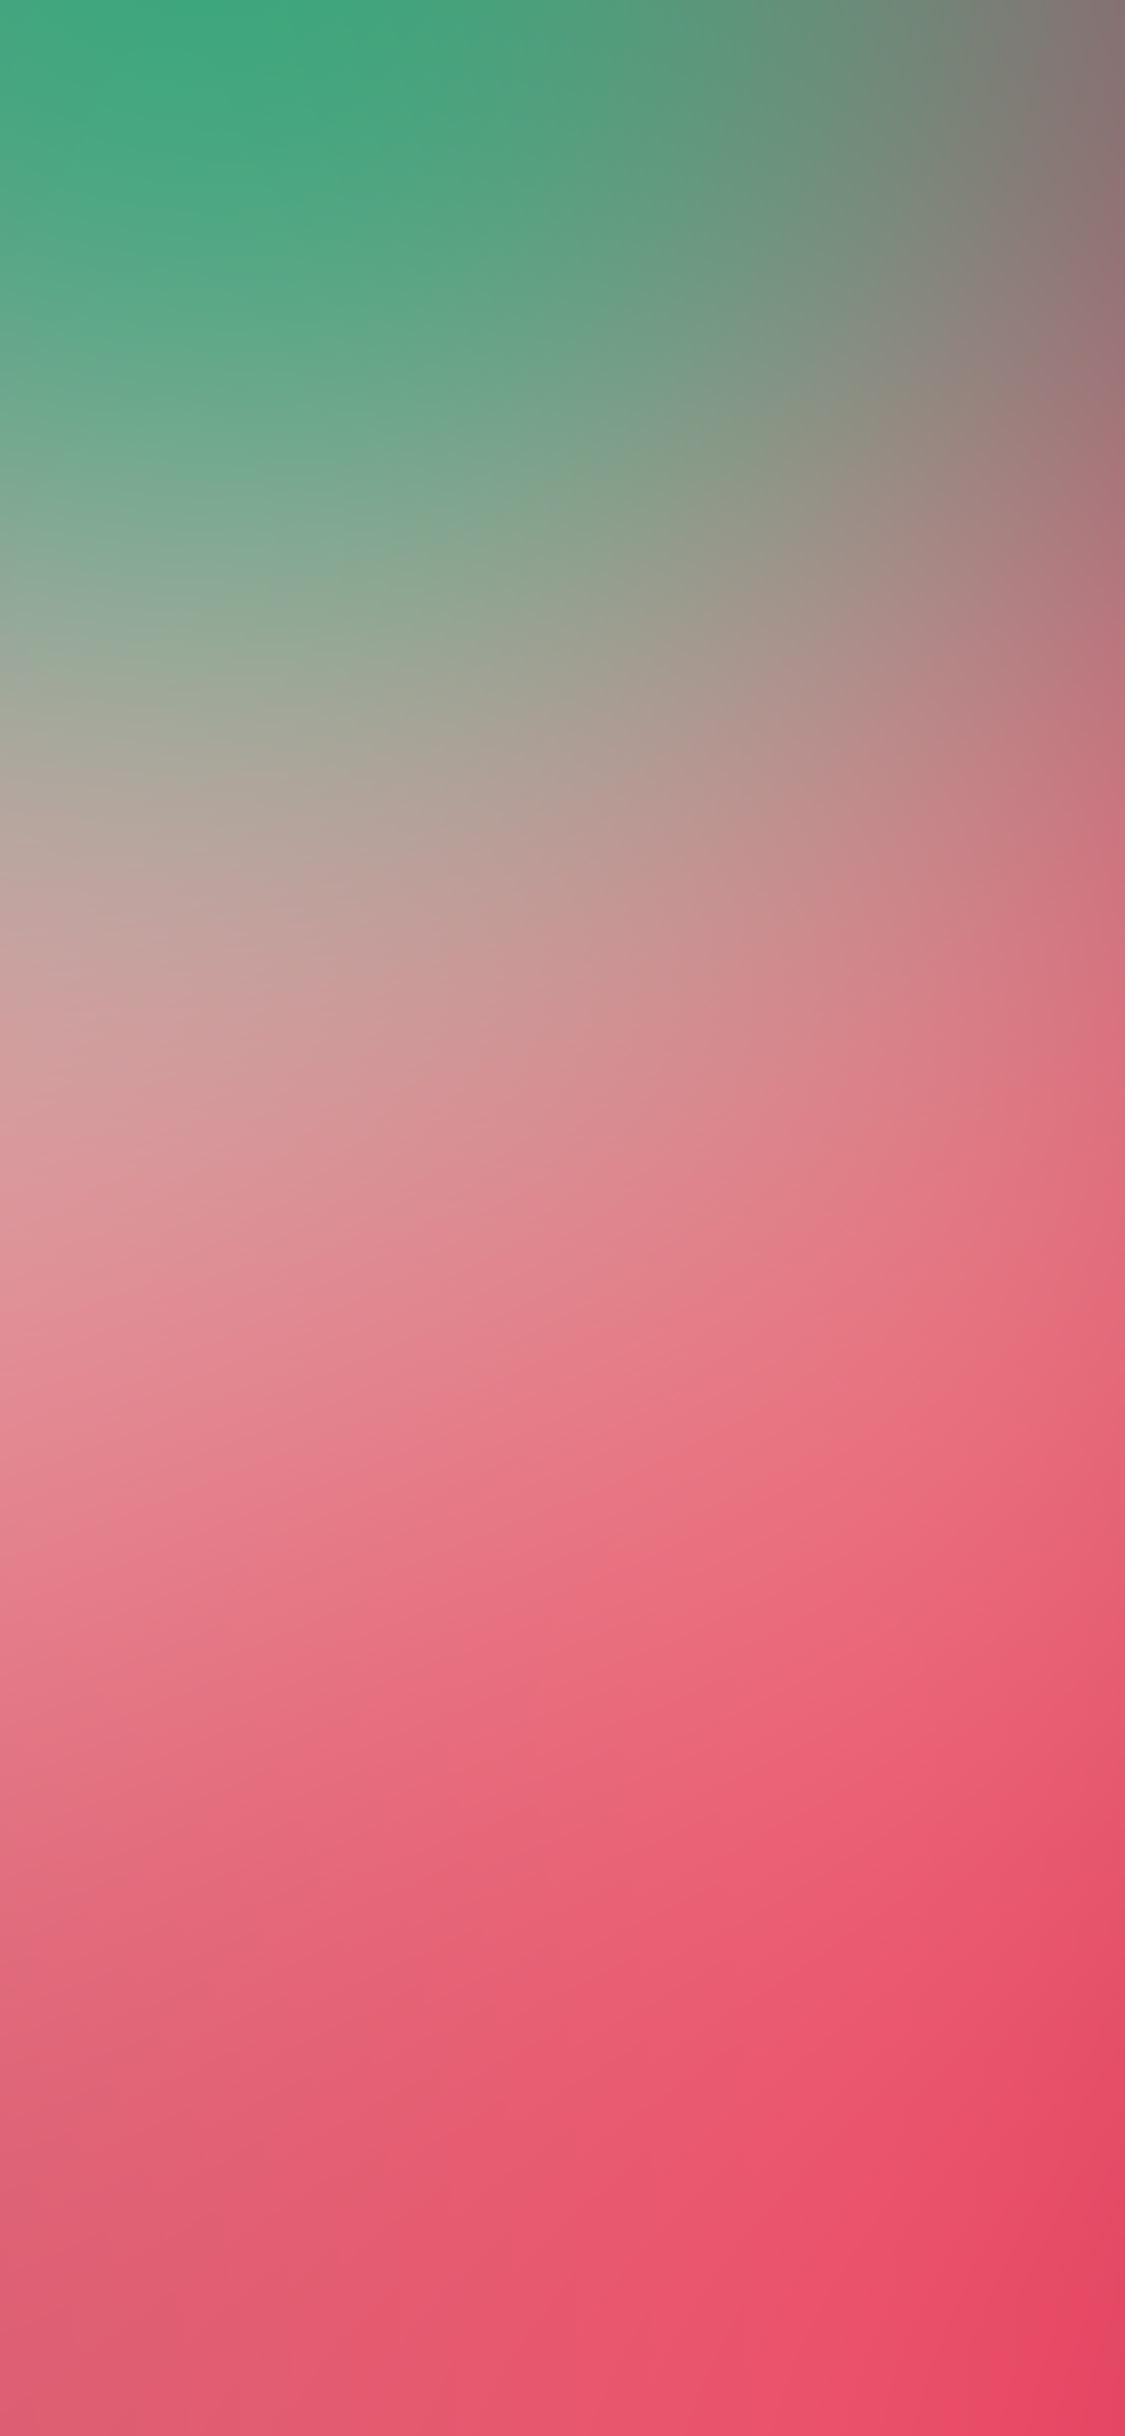 iPhonexpapers.com-Apple-iPhone-wallpaper-sn47-pink-green-dot-blur-gradation